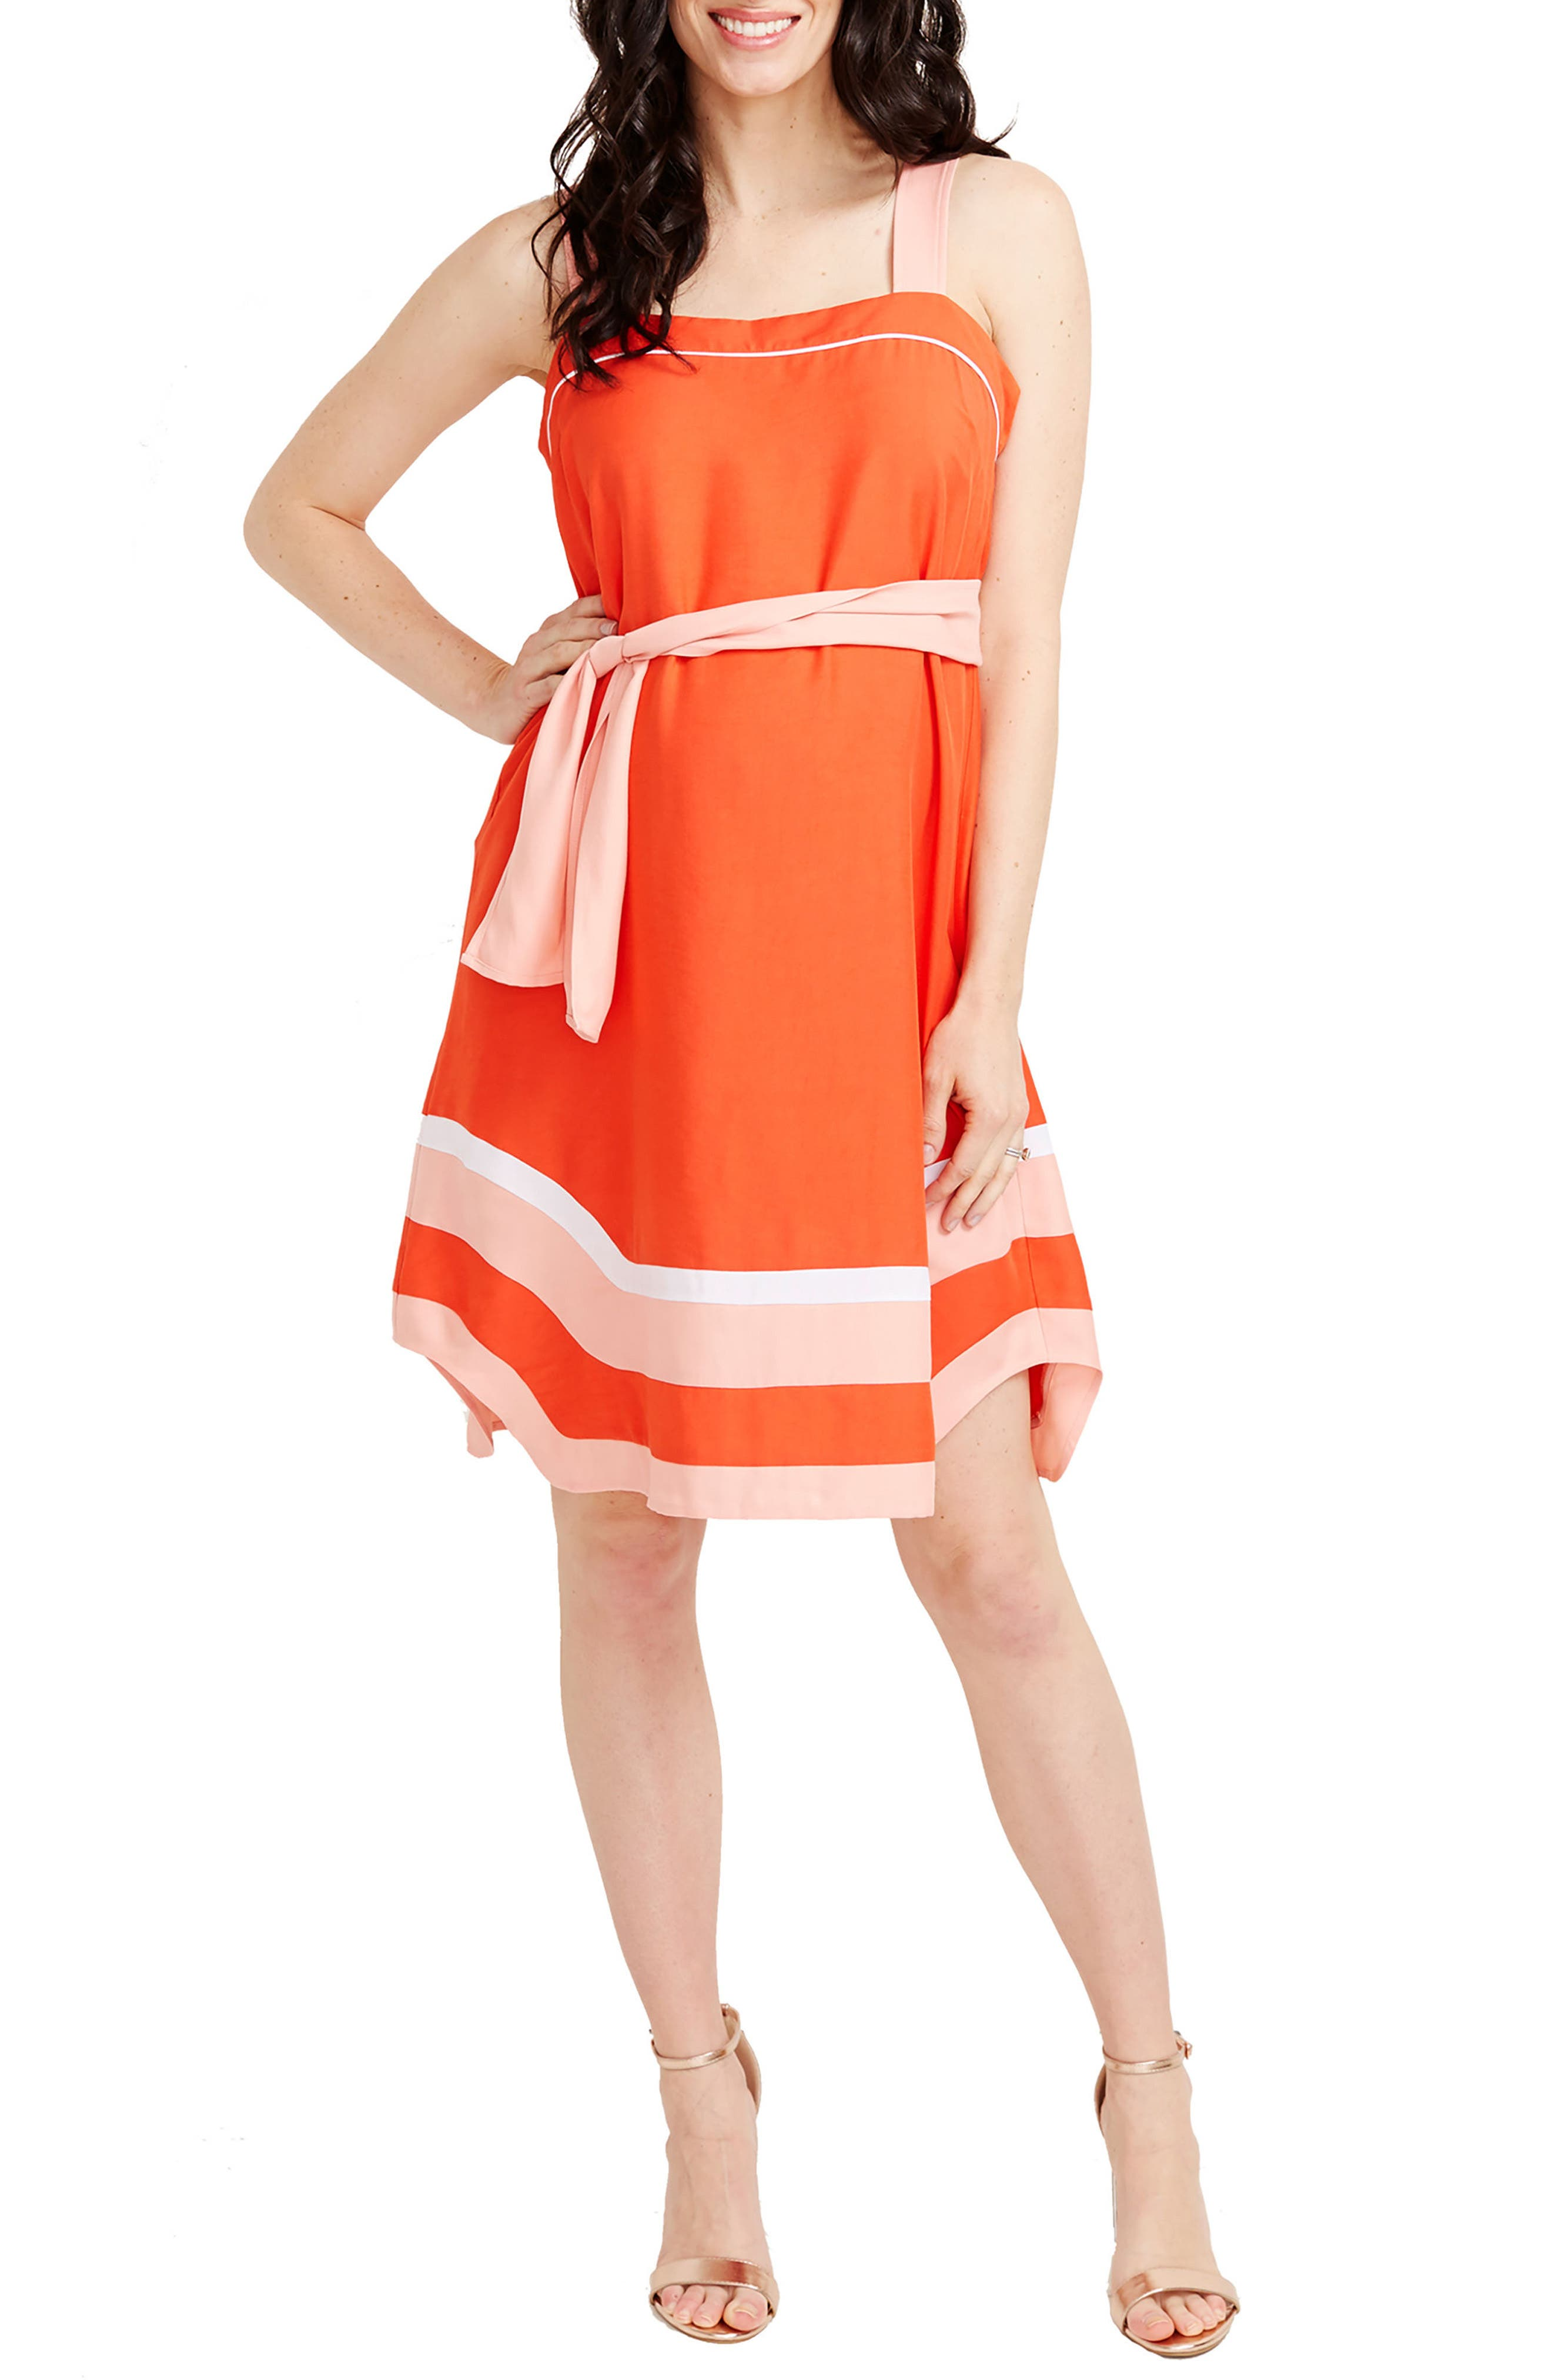 ROSIE POPE Delfina Maternity Dress, Main, color, 820